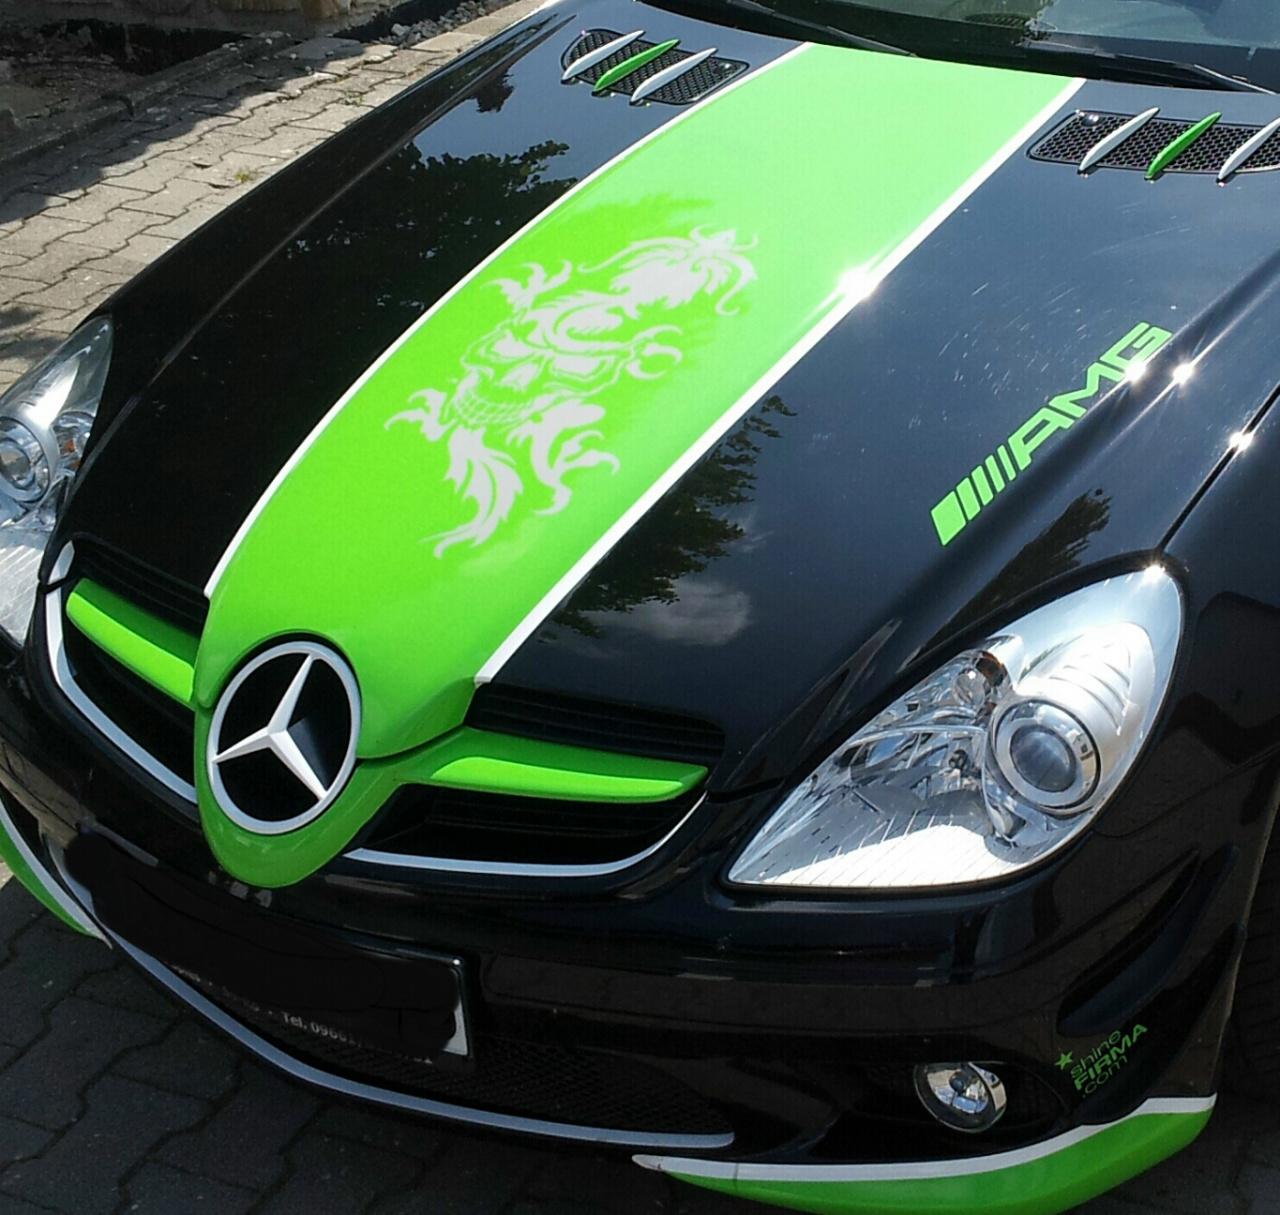 Mercedes Benz Gle 350 >> SLK 350 R171 Bj.2005 - Leserfotos - Mercedes-Fans - Das ...